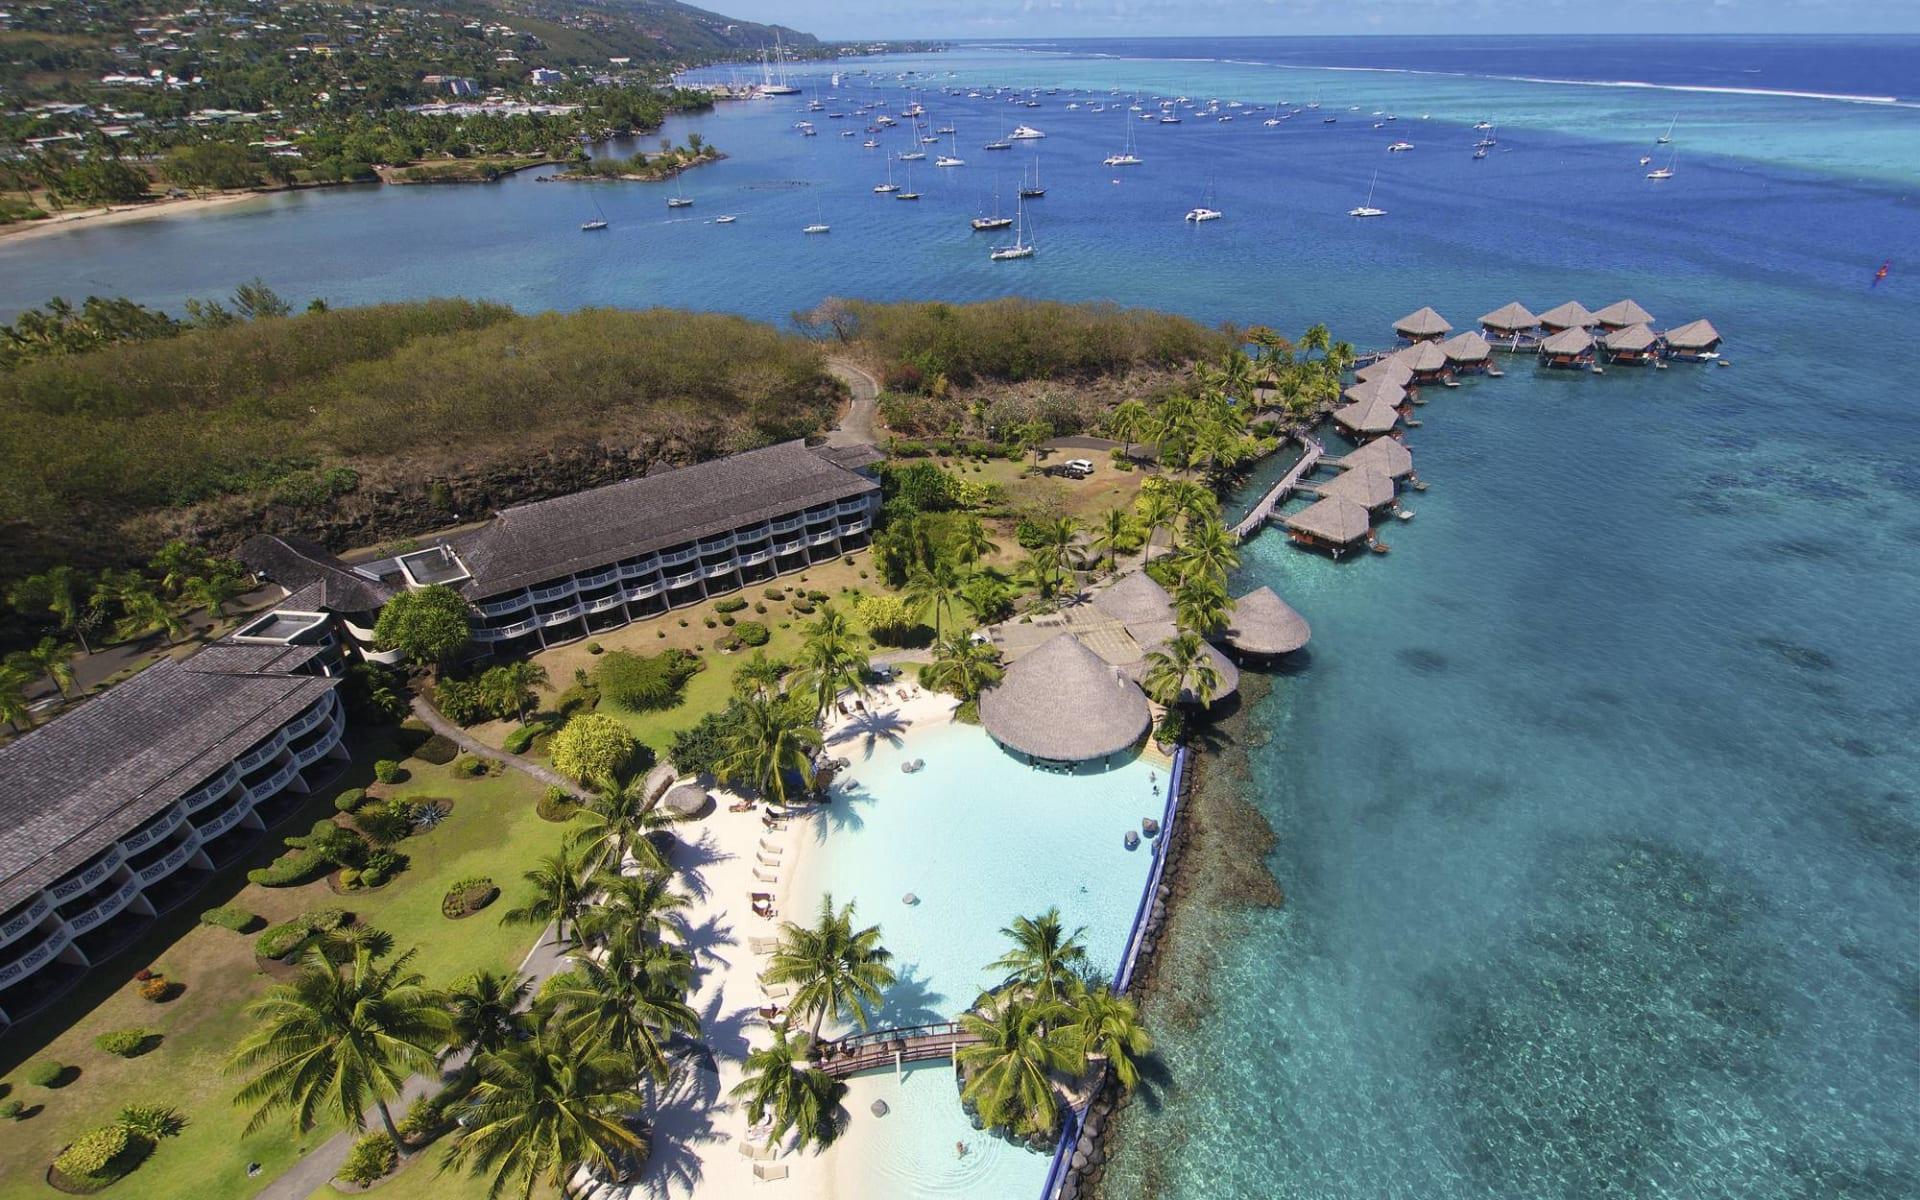 InterContinental Tahiti Resort in Papeete - Faa'a:  Intercontinental Tahiti Resort - Aerial View über das Resort 2017